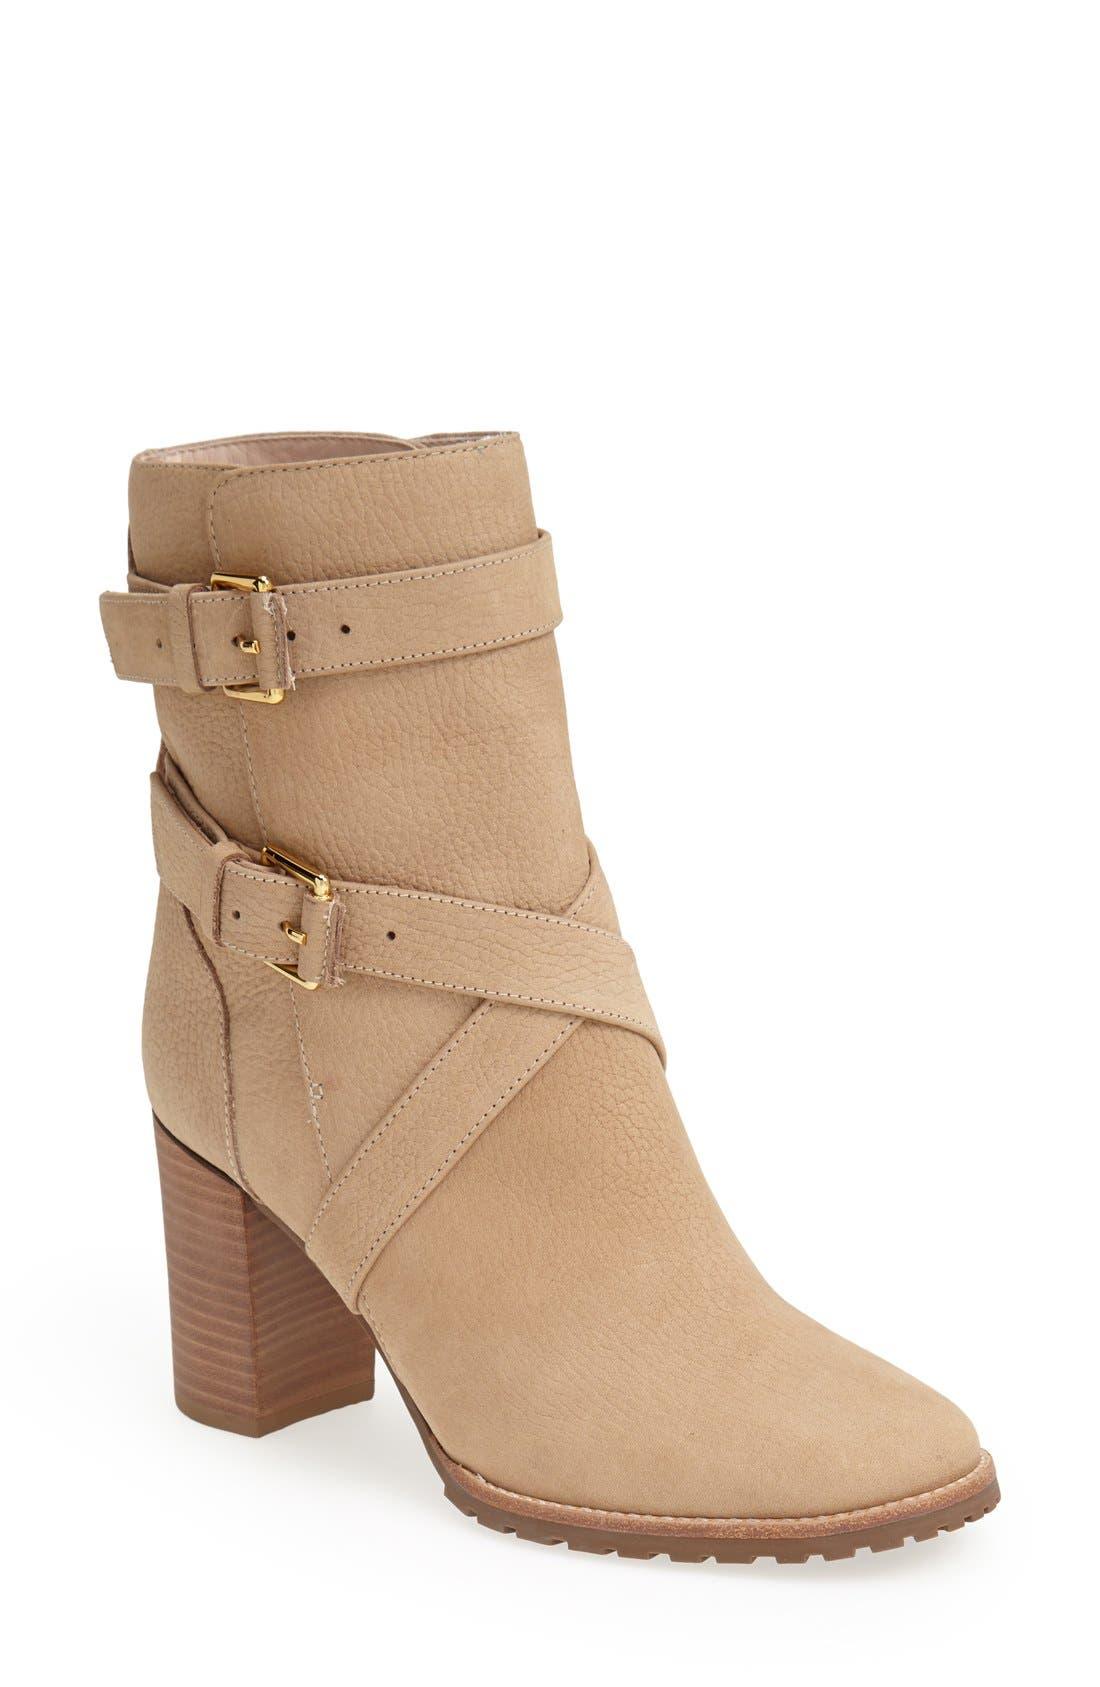 Main Image - kate spade new york 'layne' boot (Women)